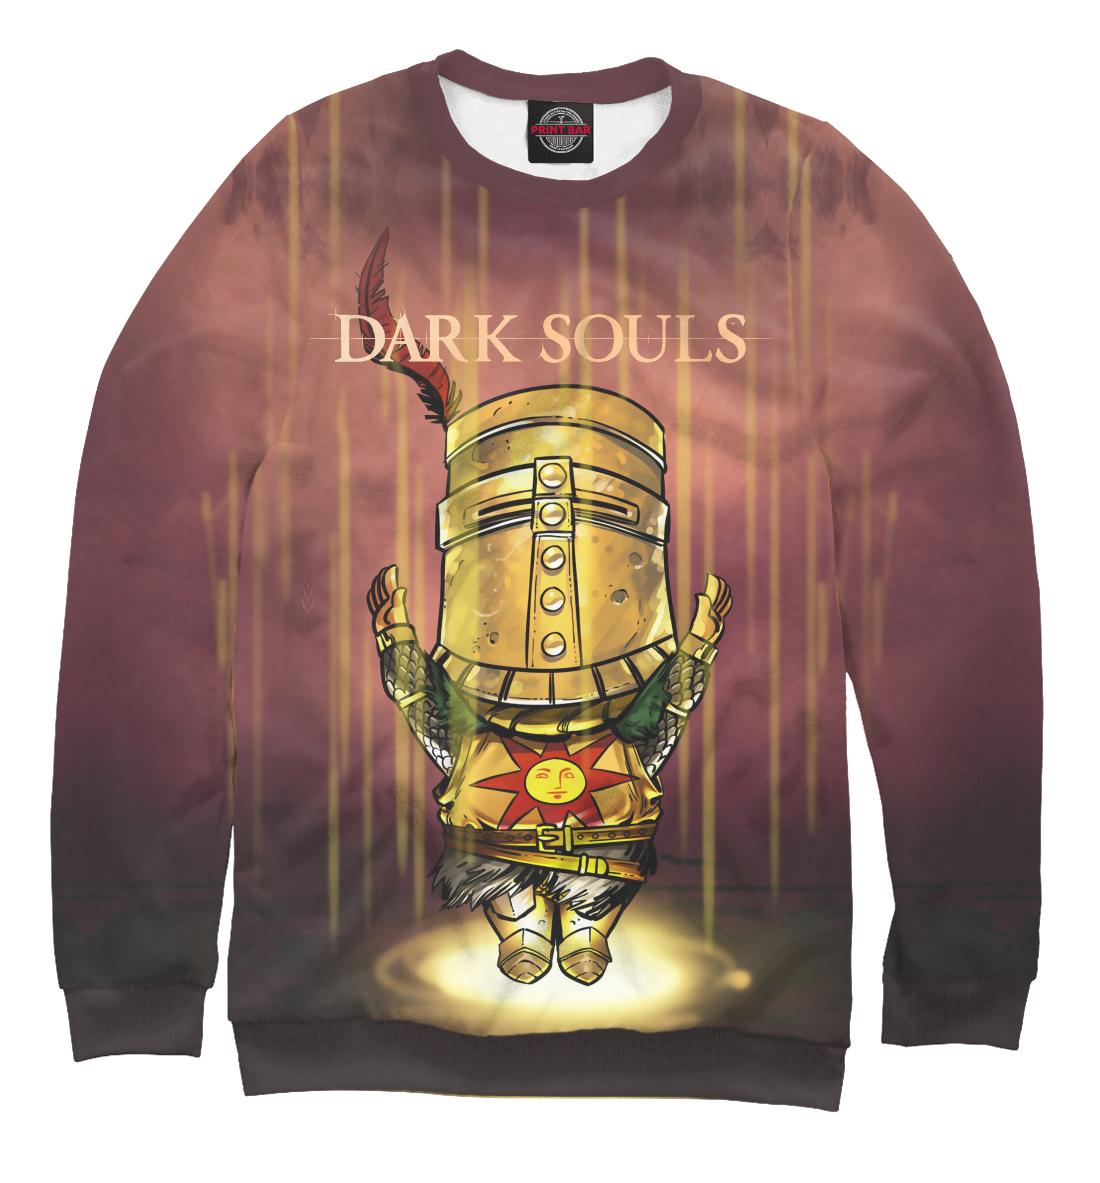 Купить Dark Souls, Printbar, Свитшоты, DKS-806132-swi-2